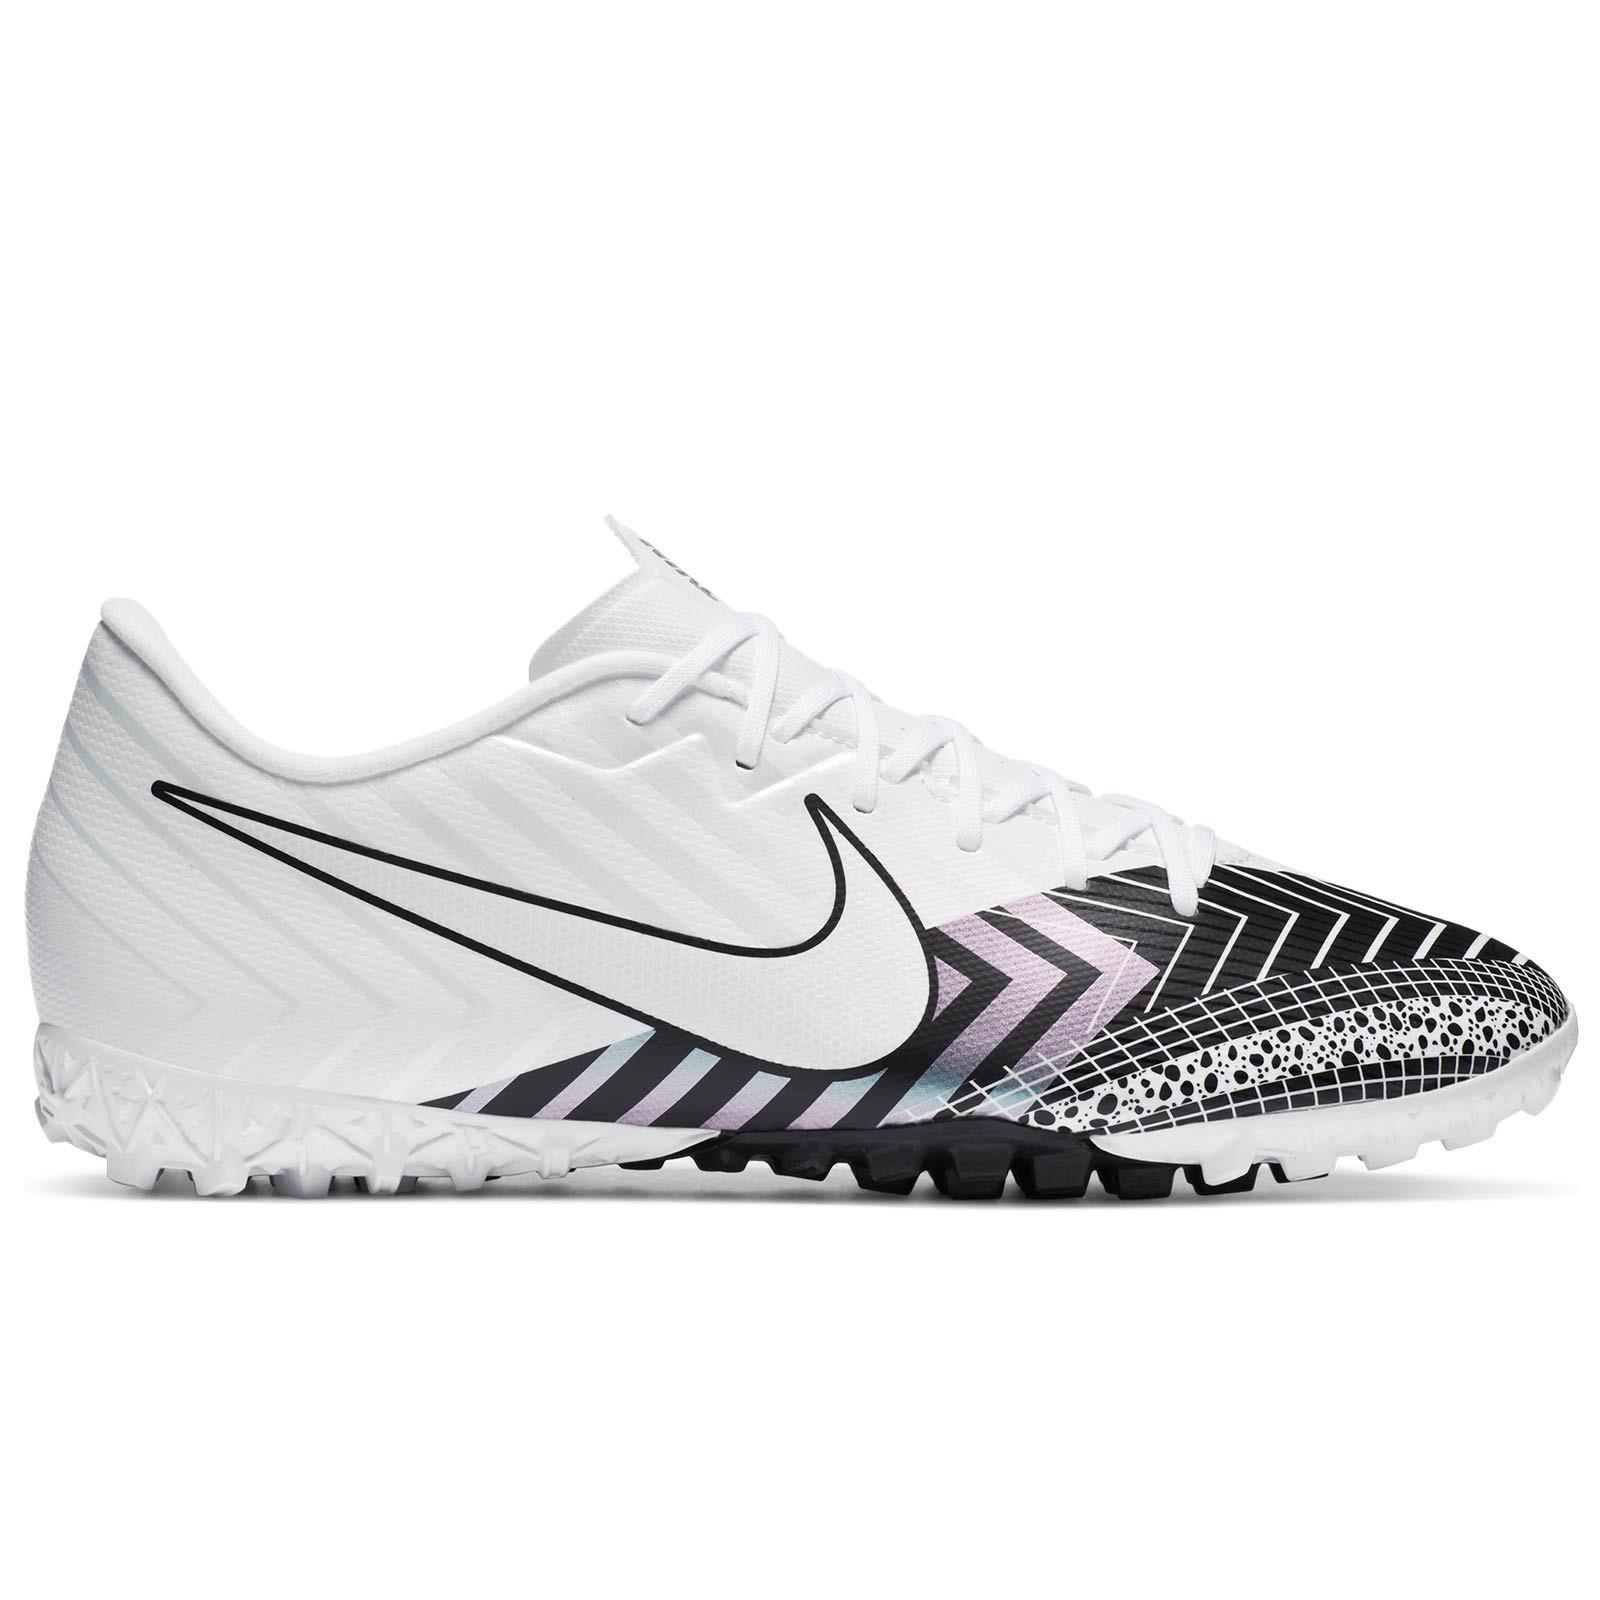 Suministro Surgir Pensar  Nike Mercurial Vapor 13 Academy MDS TF blanca | futbolmania